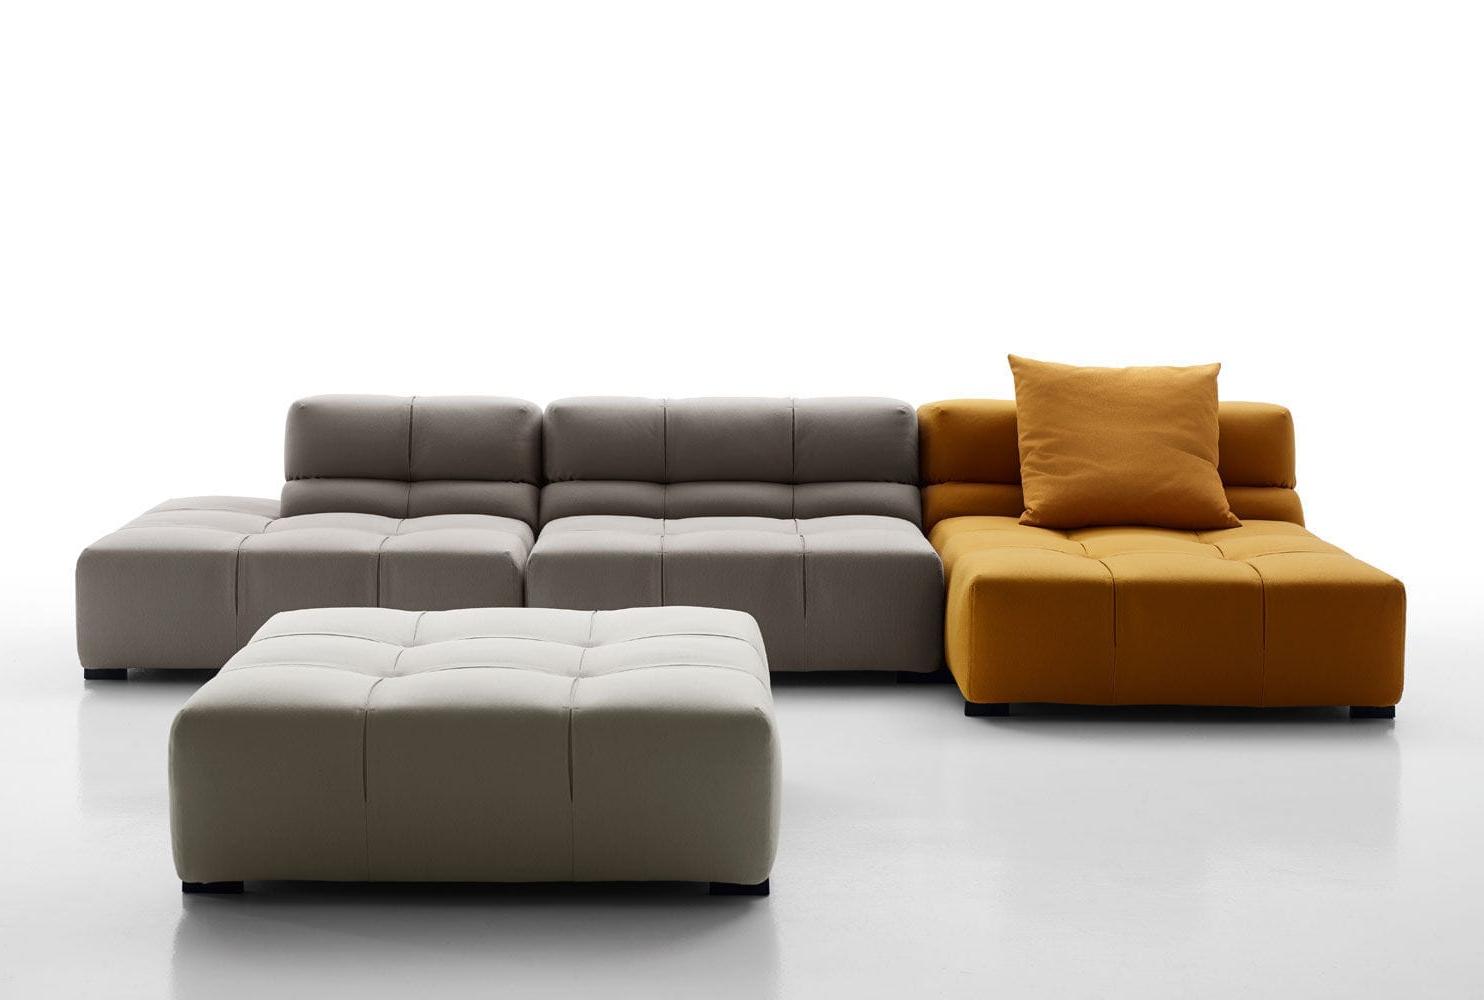 Sofa Modular J7do Modular sofa Contemporary Leather Fabric Tufty Time 15